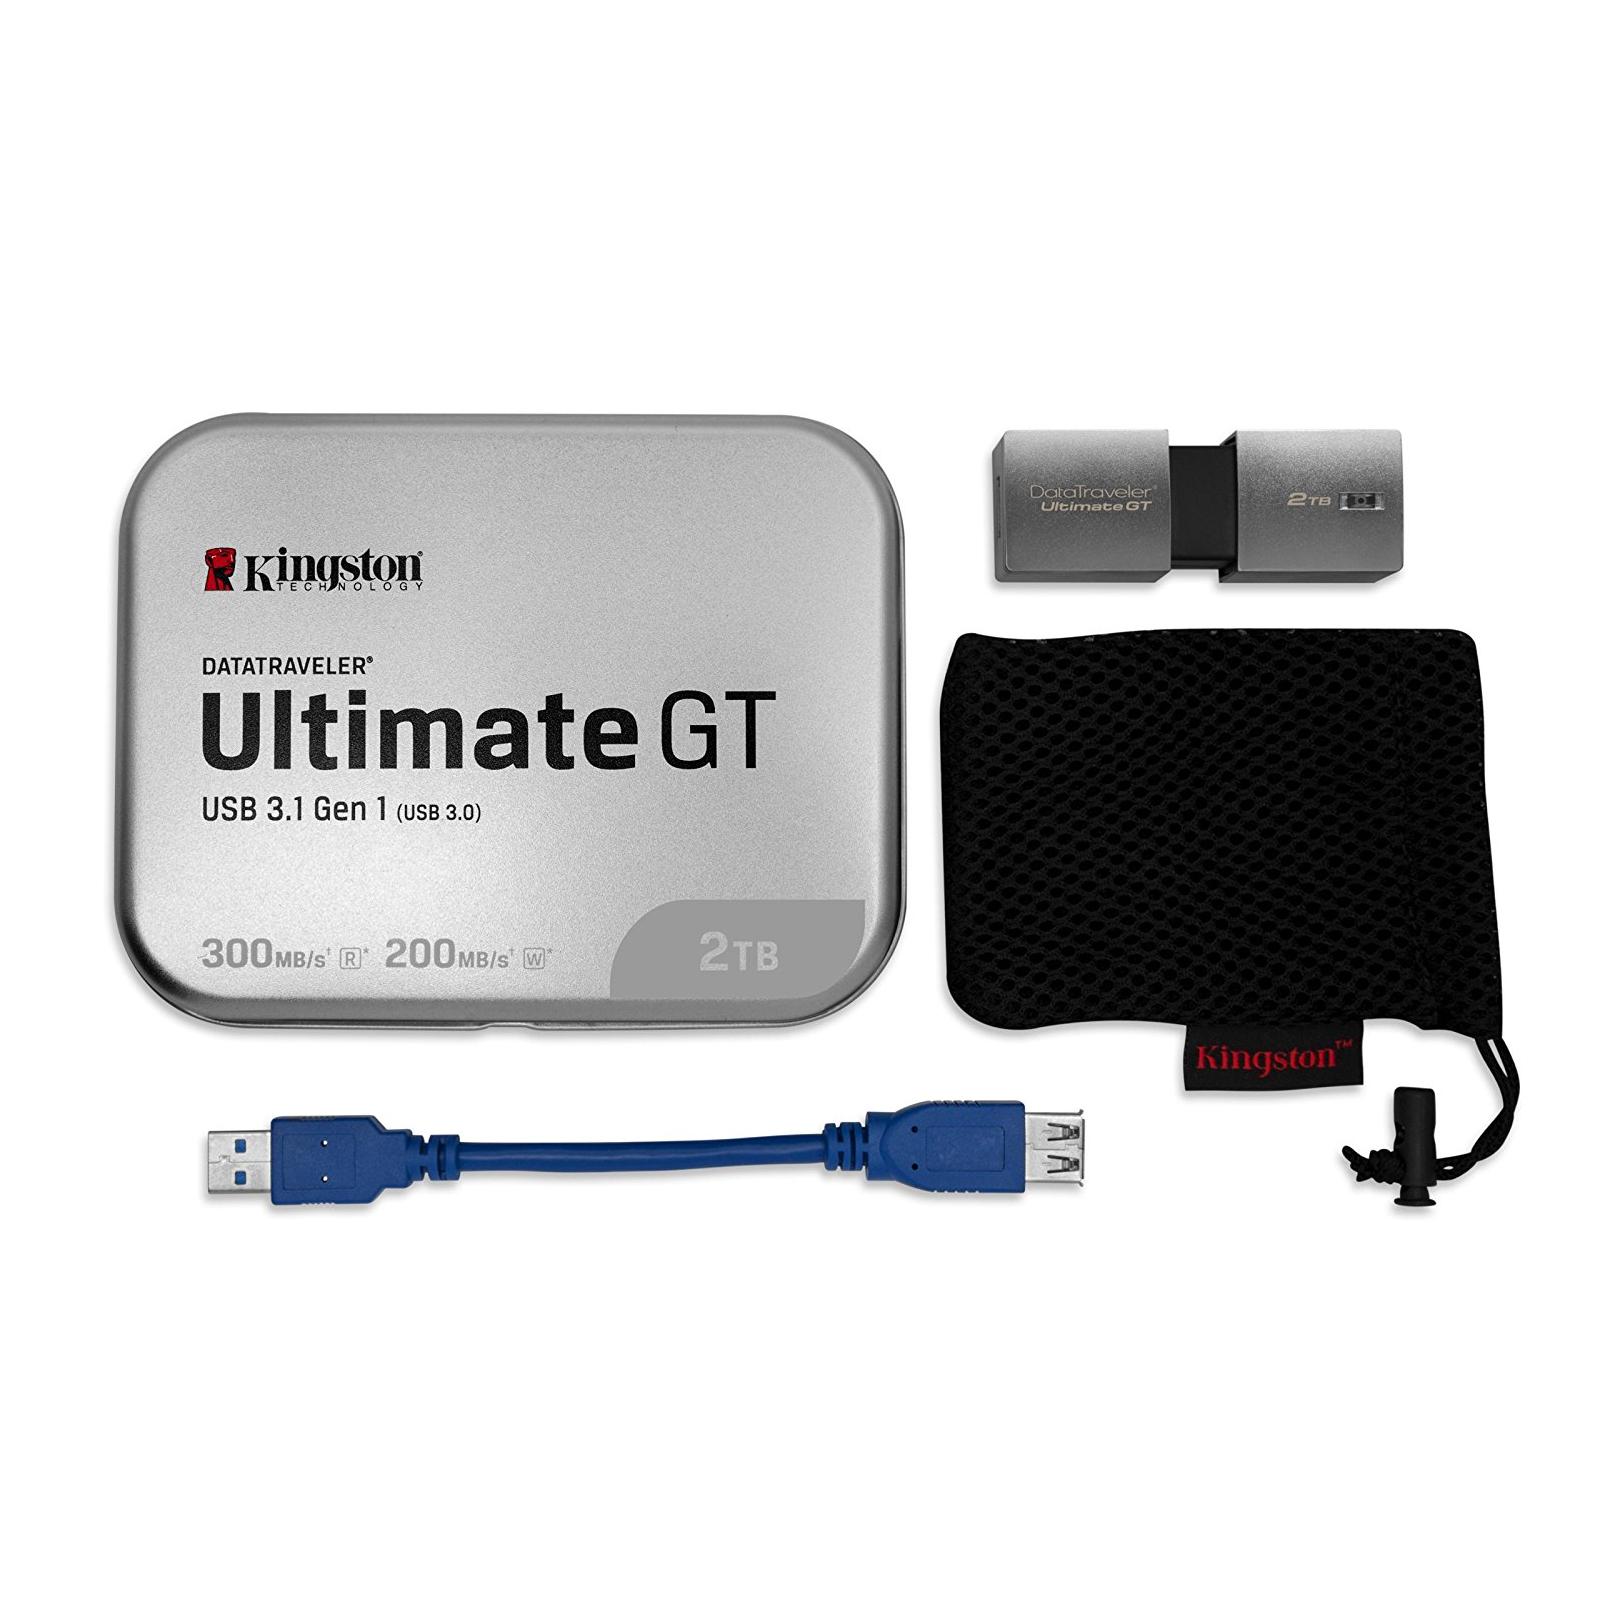 USB флеш накопитель Kingston 2TB DataTraveler Ultimate GT Metal Silver USB 3.1 (DTUGT/2TB) изображение 7